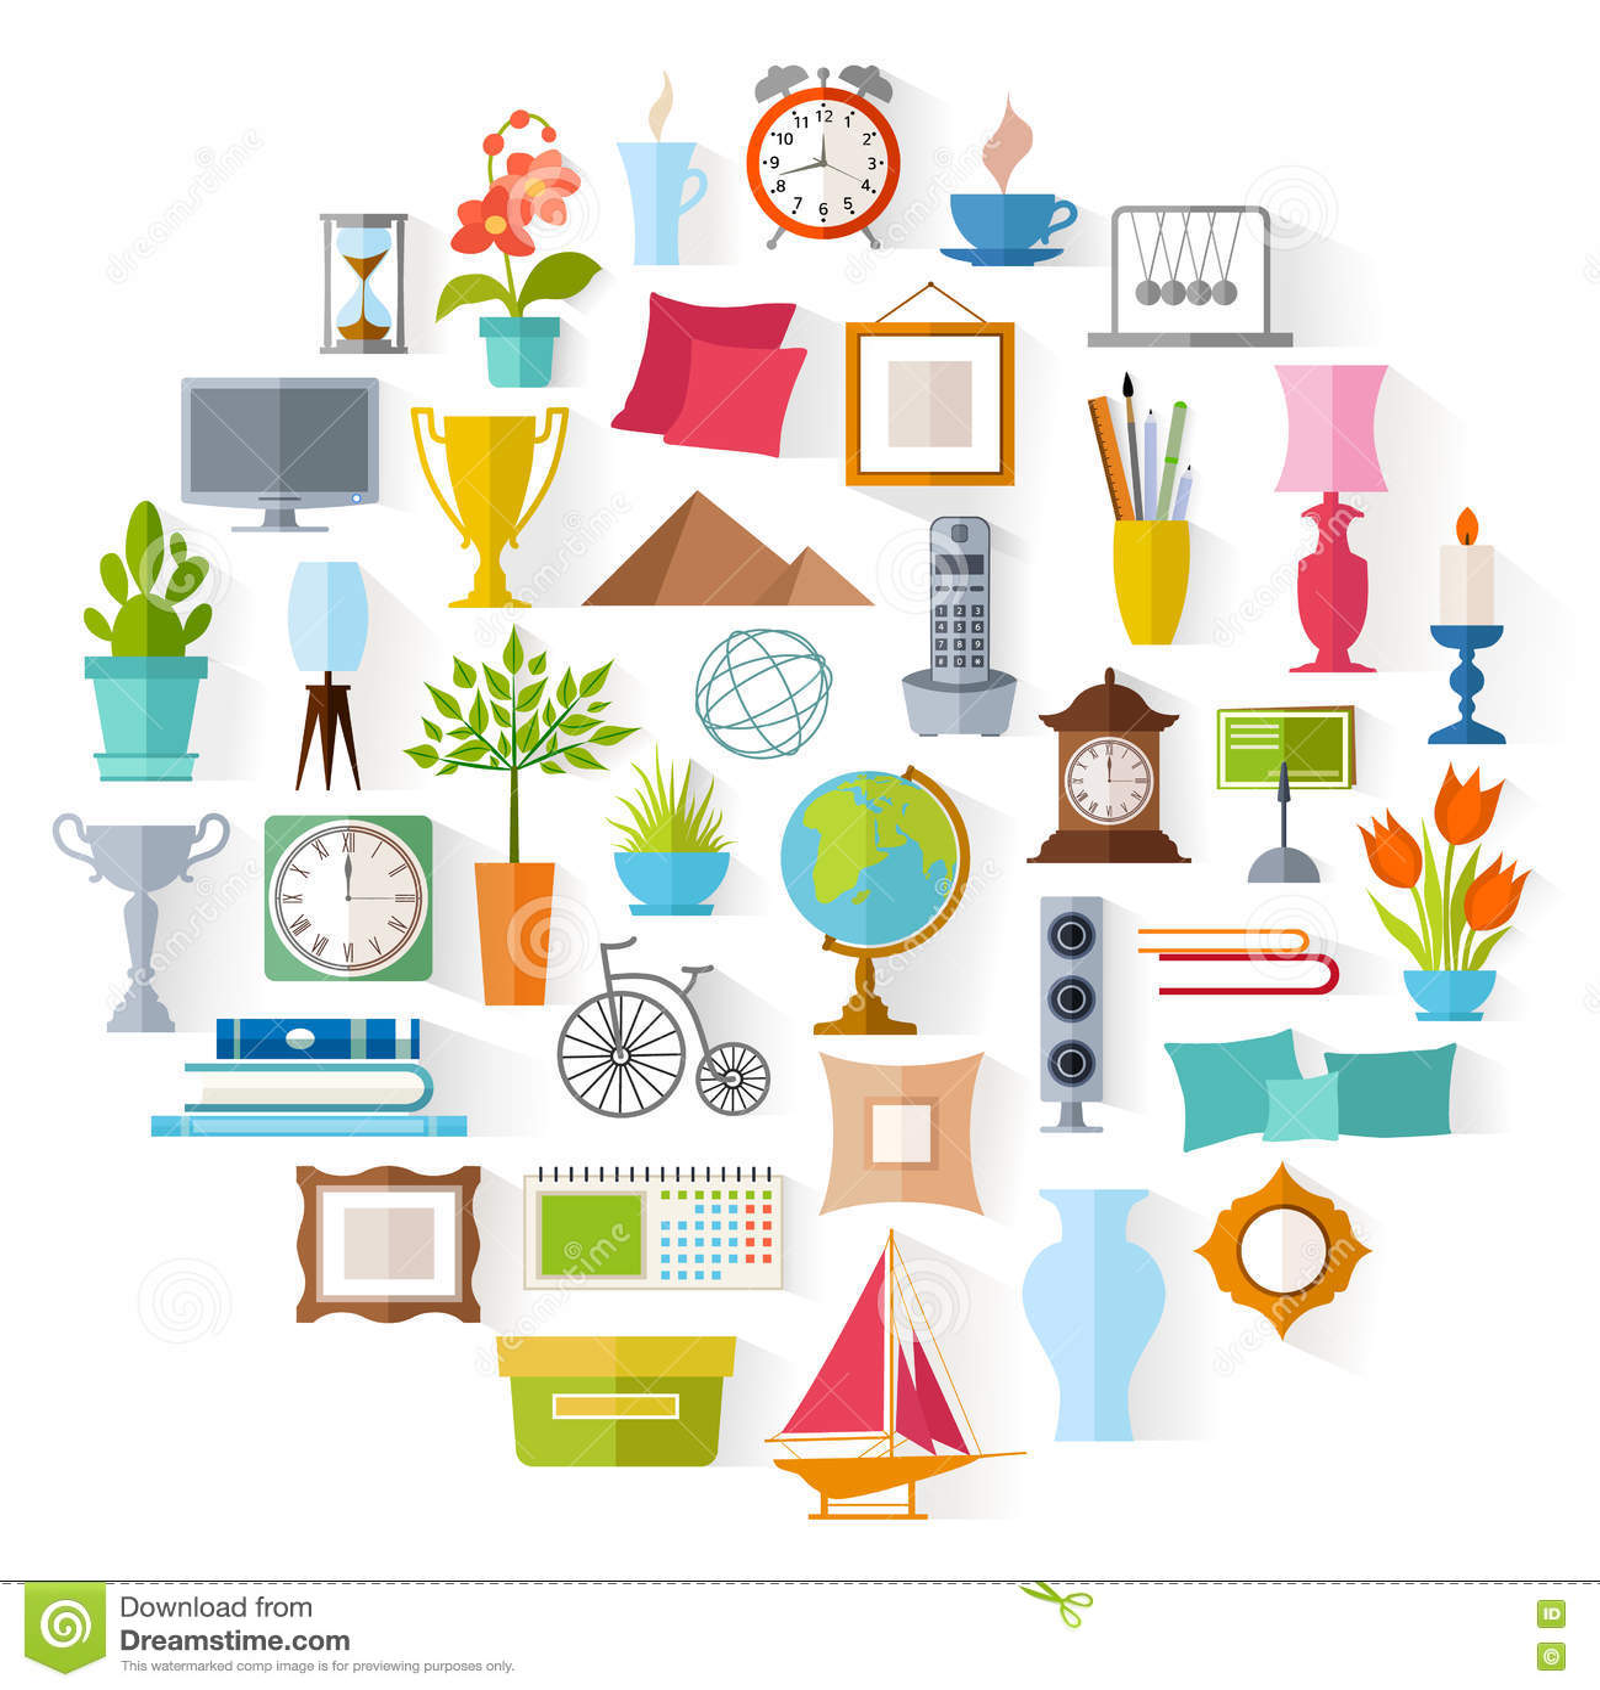 Home Decor Icon Free